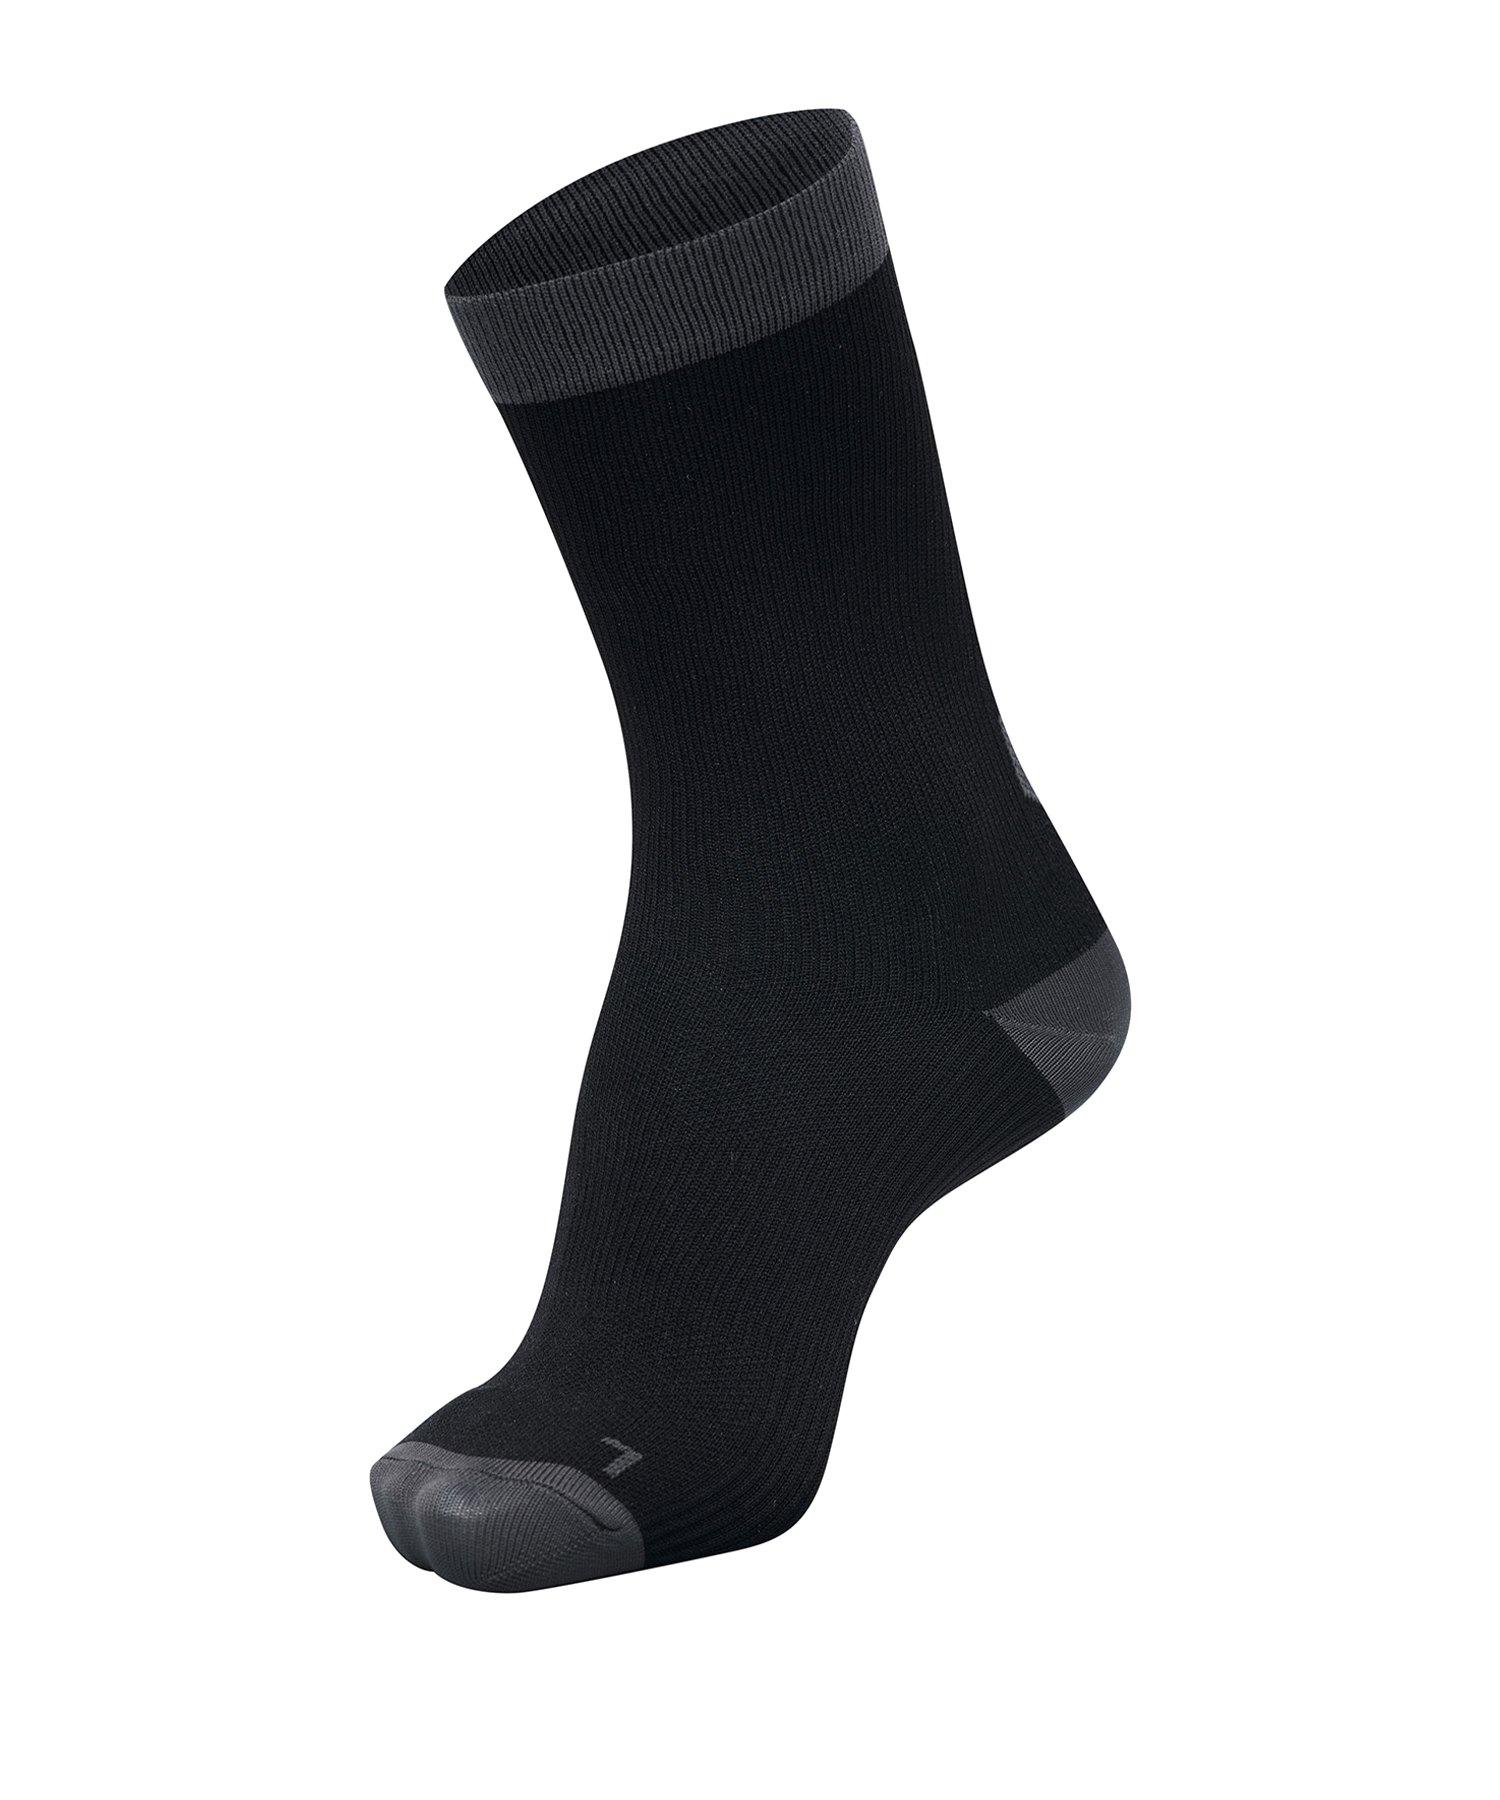 Hummel Element Performance Socken 2er Pack F1006 - Schwarz